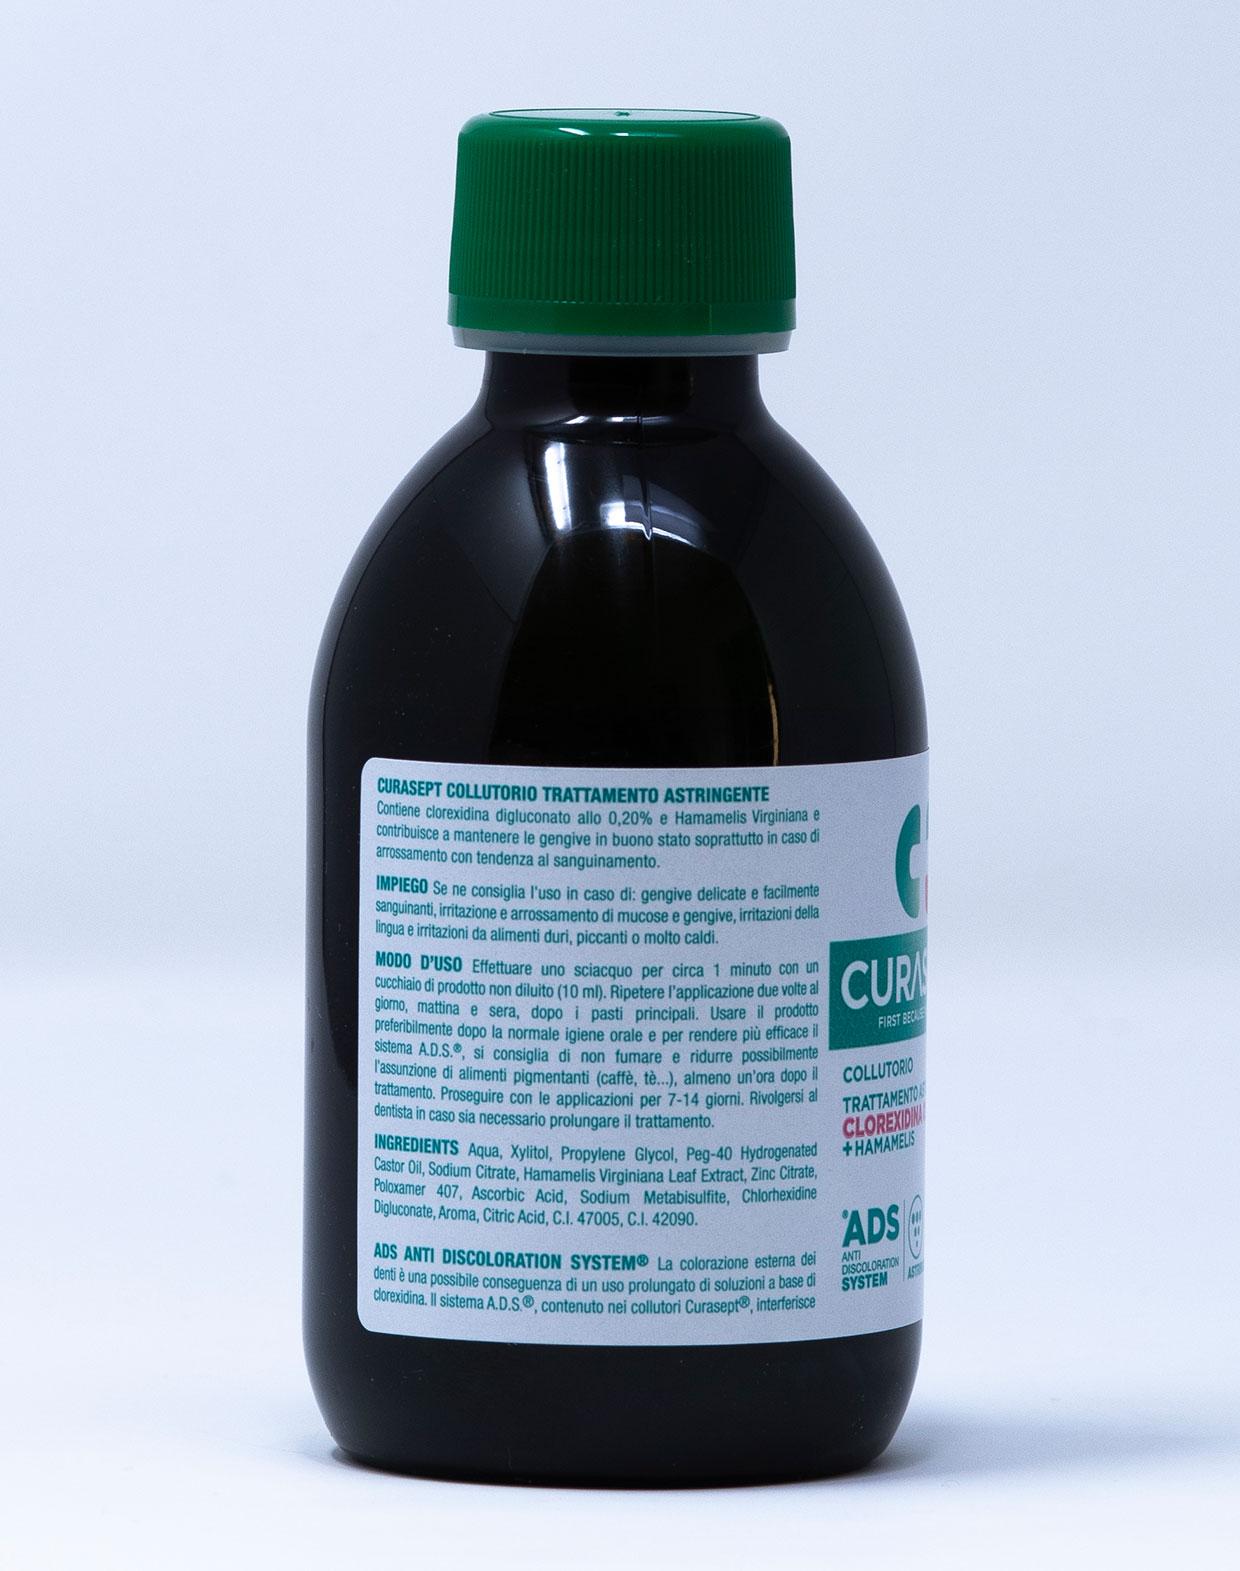 Curasept Collutorio ADS Trattamento Astringente 0,20% Con Hamamelis - 200 ml